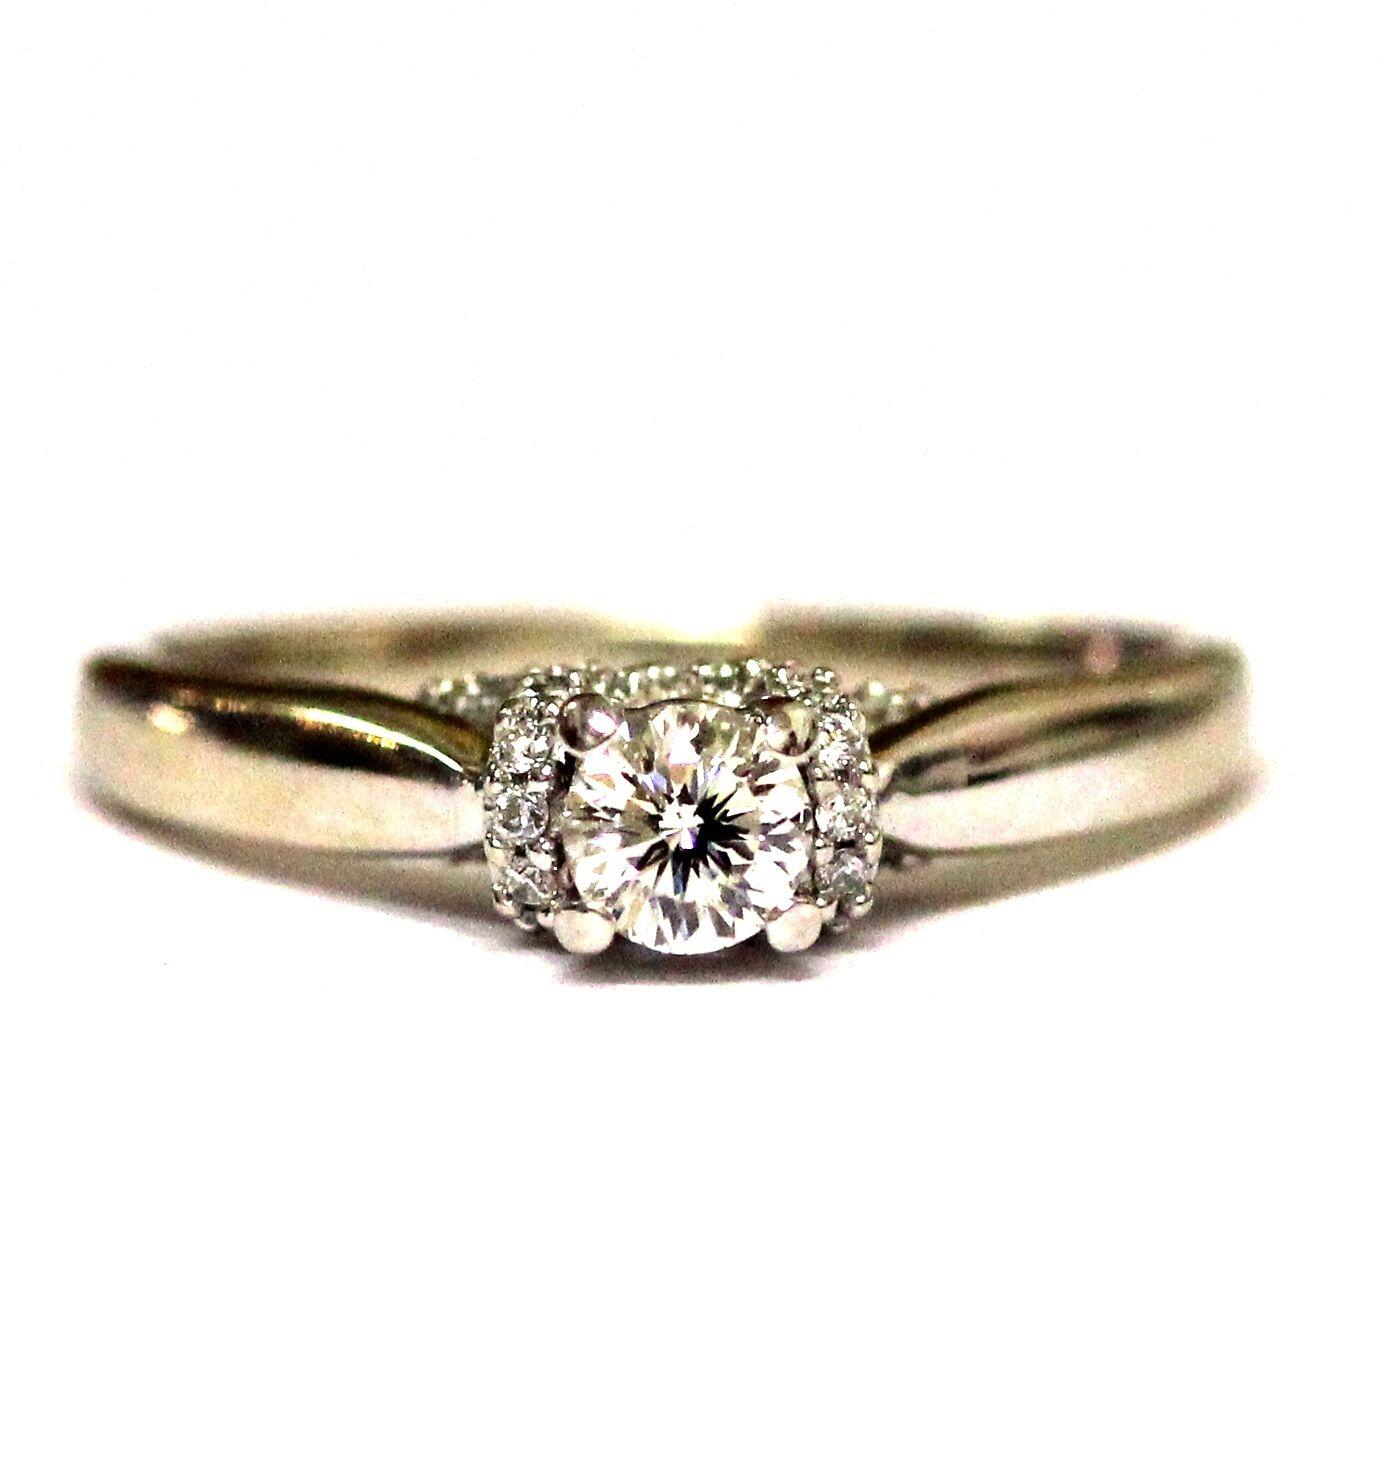 18k white gold .45ct SI1 H round celebration diamond engagement ring 4.5g estate